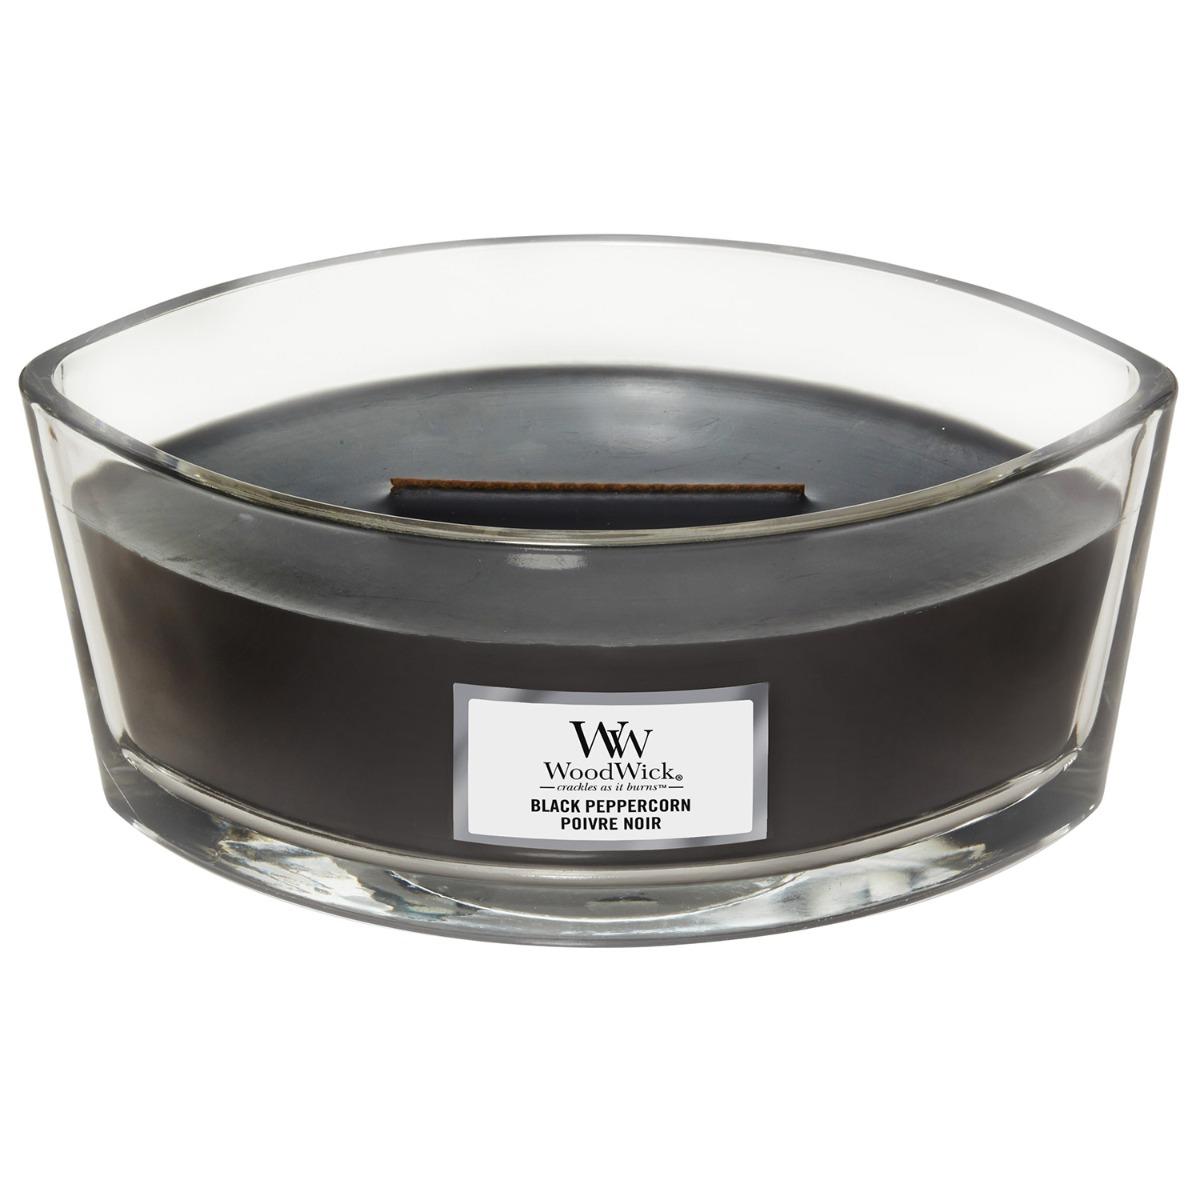 WoodWick Black Peppercorn Hearthwick Ellipse Candle